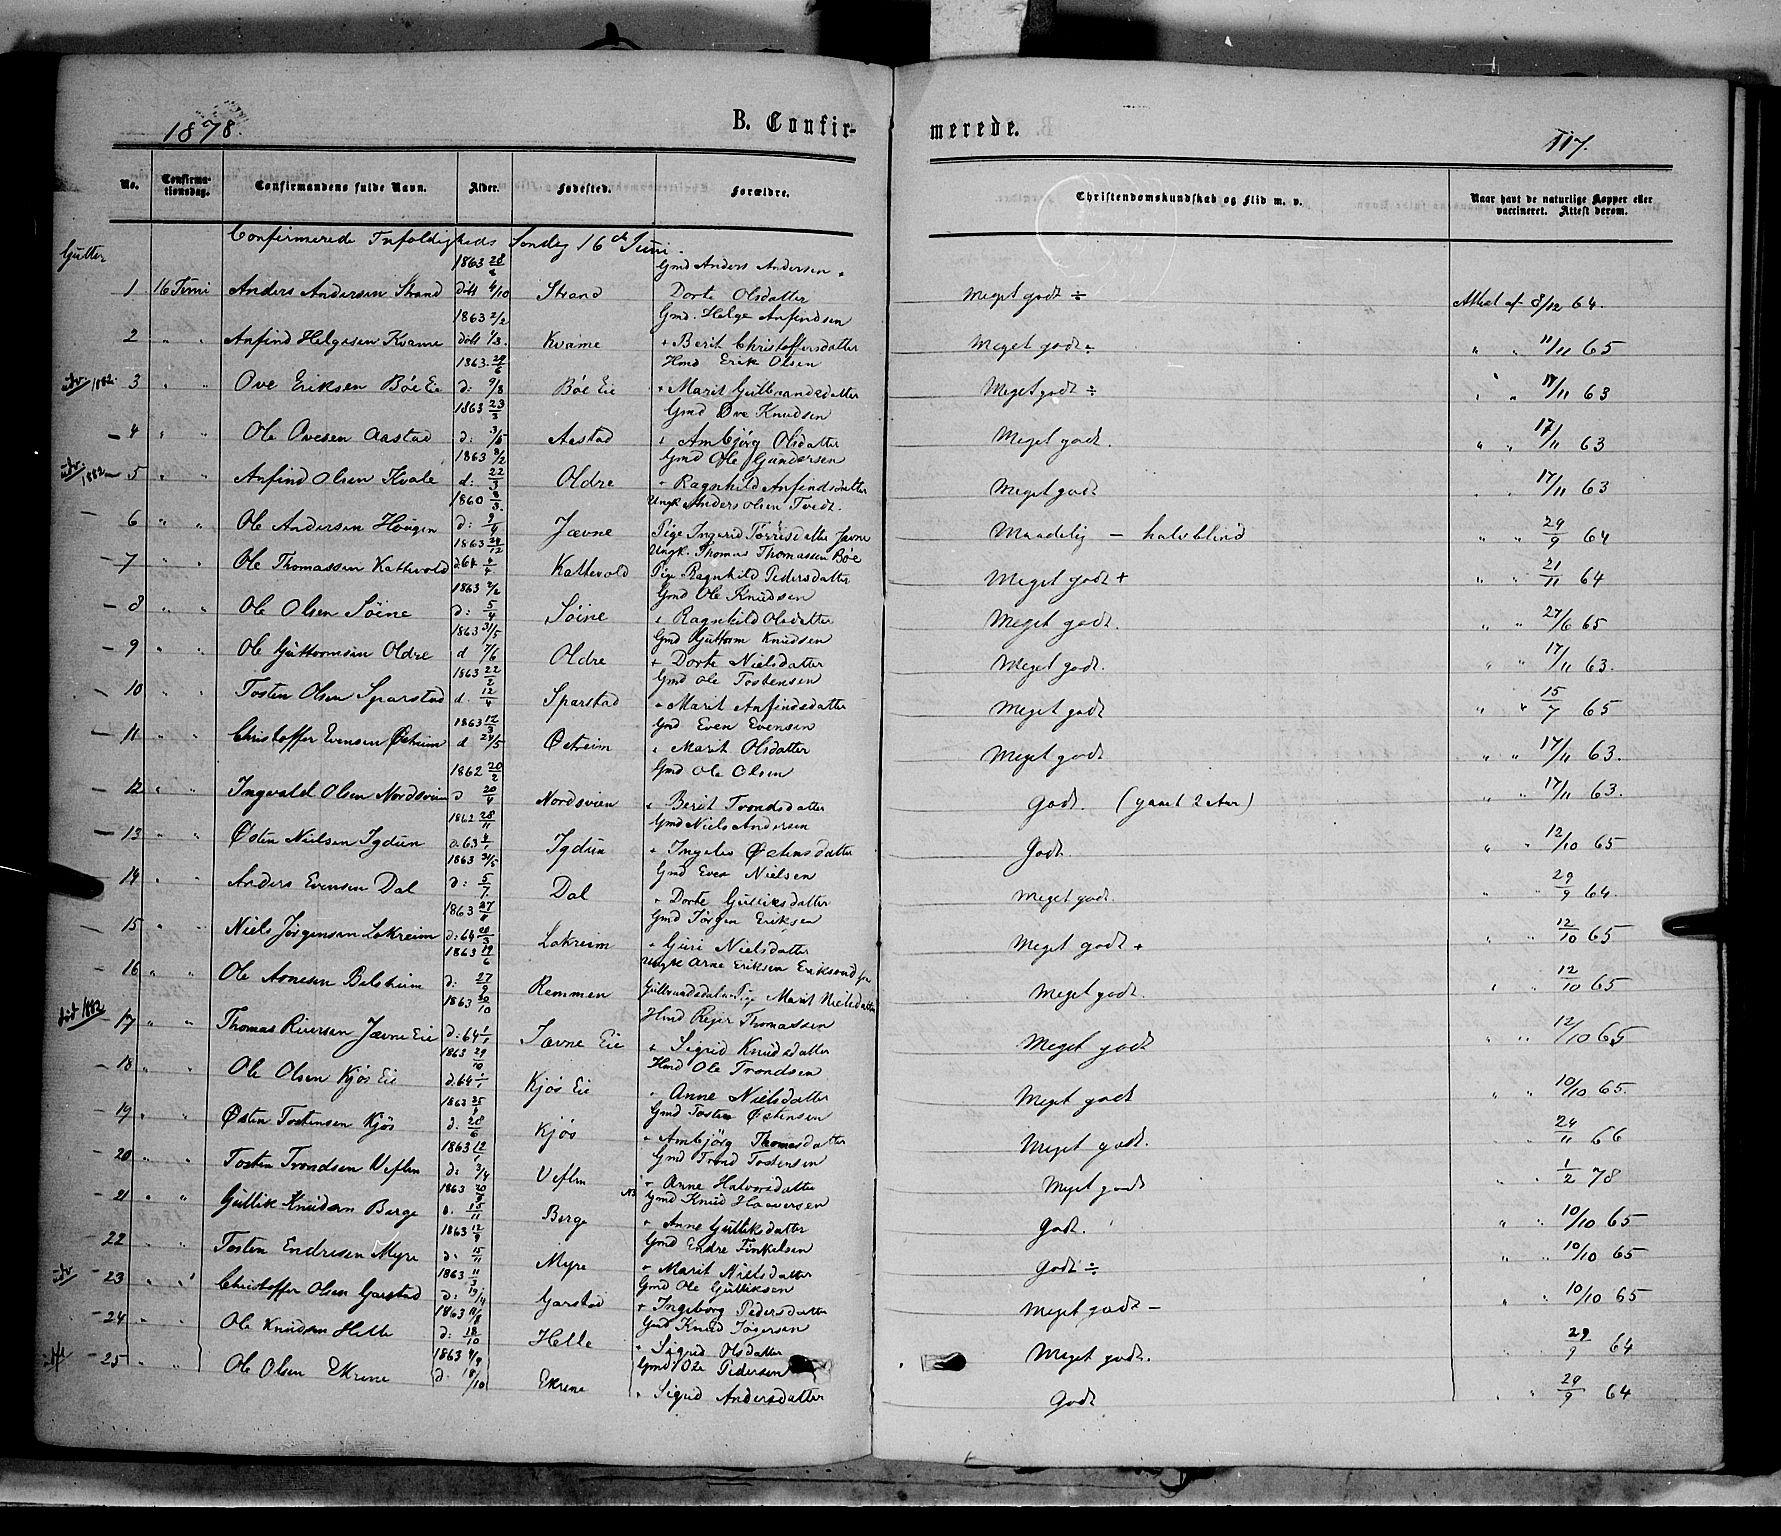 SAH, Vang prestekontor, Valdres, Parish register (official) no. 7, 1865-1881, p. 117